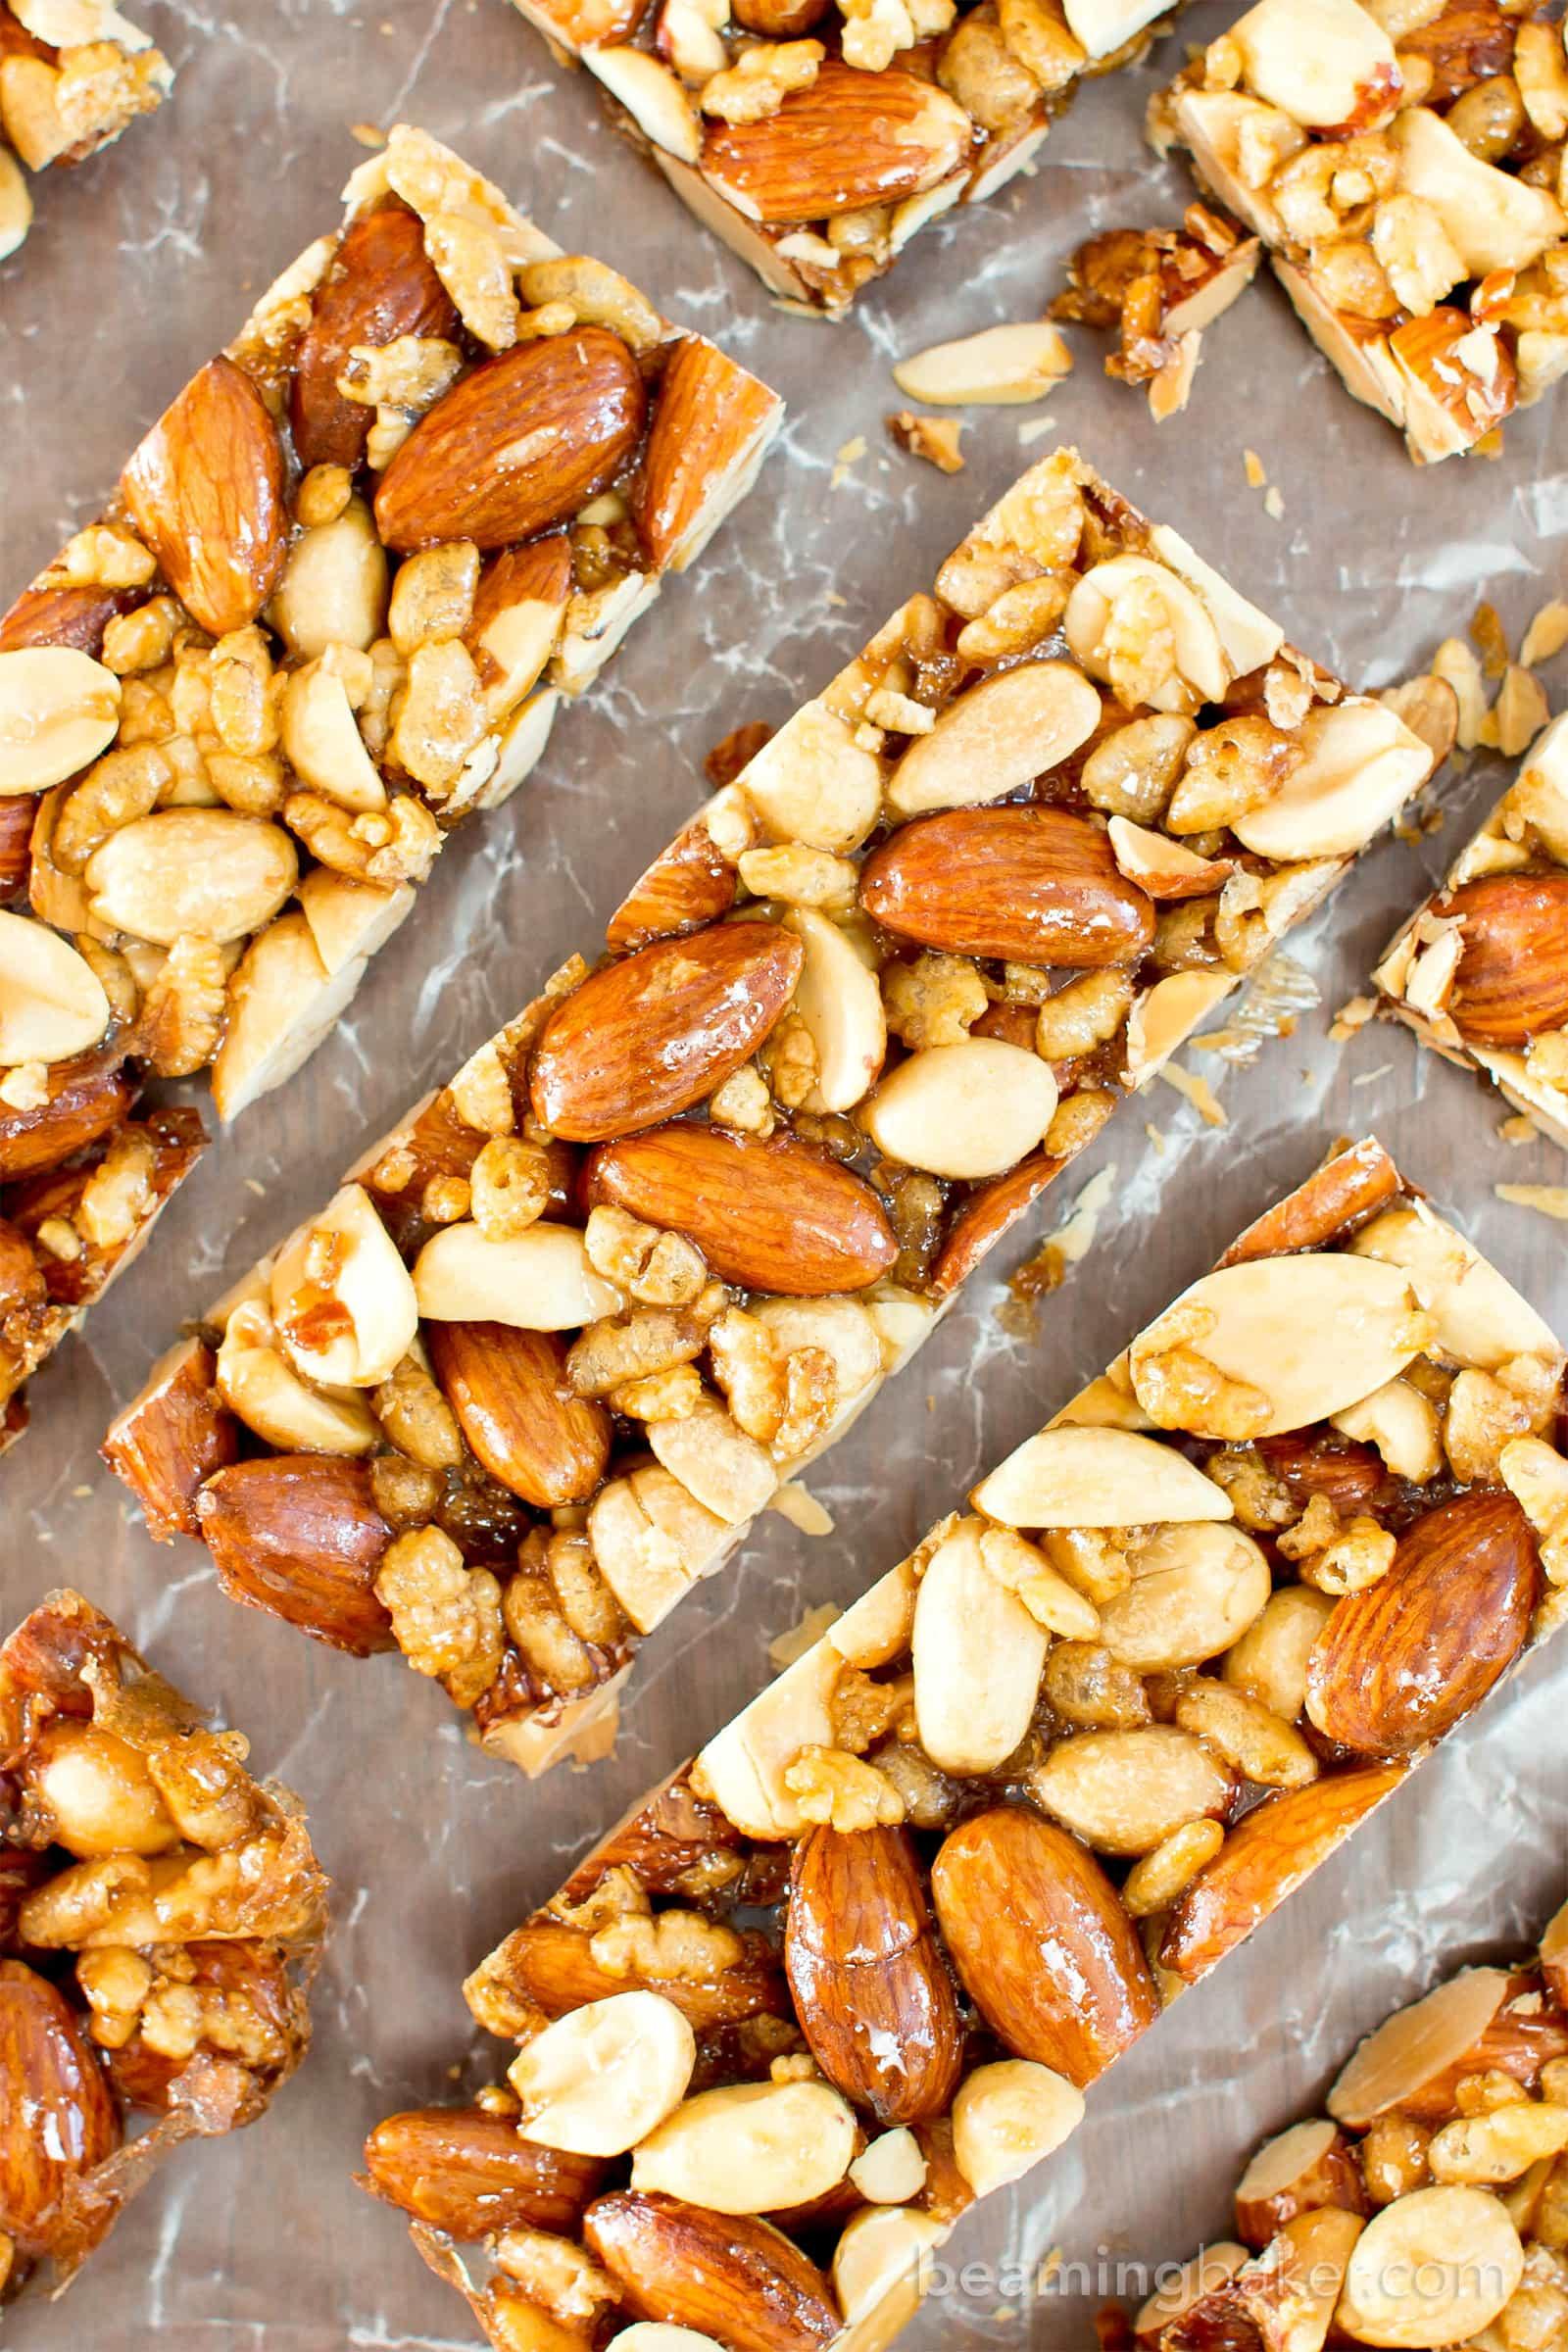 Healthy Vegan Snacks  15 Easy Healthy Gluten Free Vegan Snack Recipes Beaming